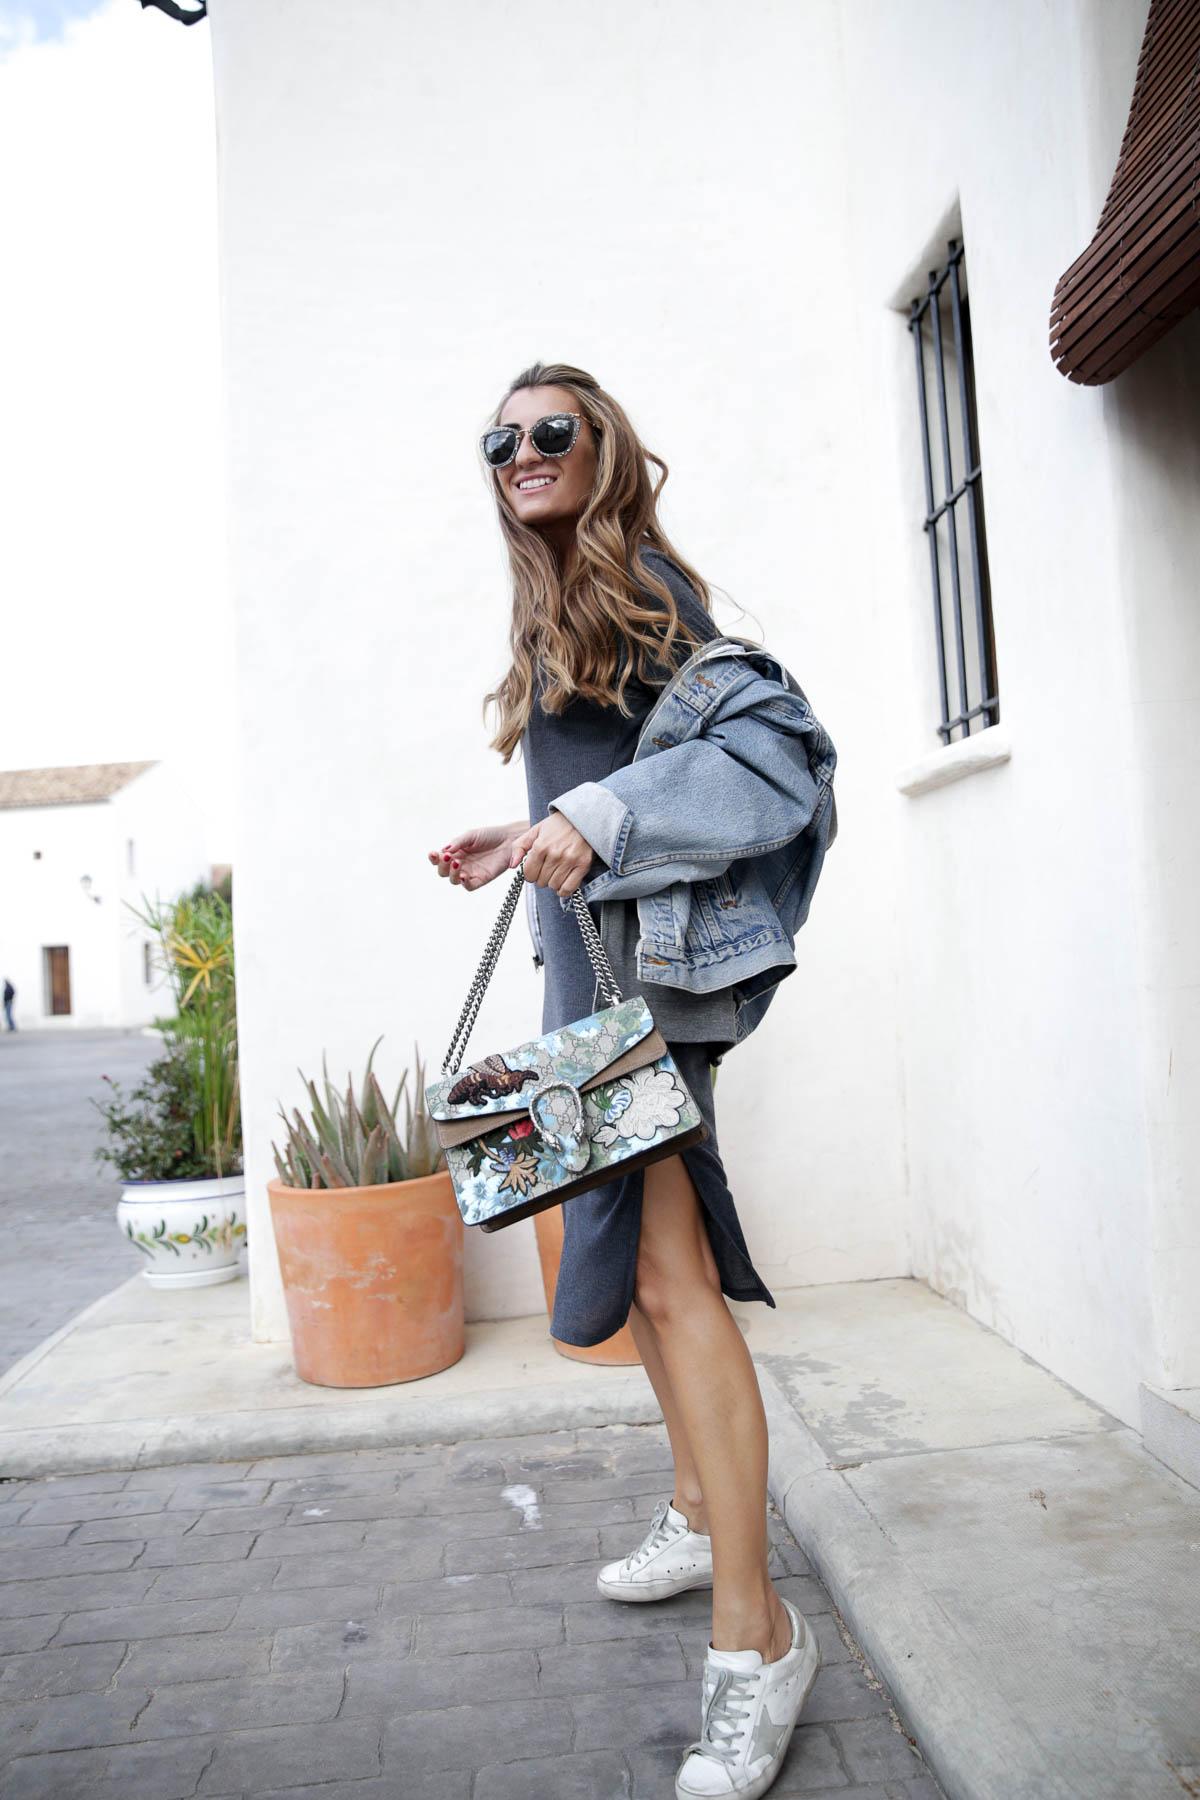 black-friday-a-bicyclette-sweatshirt-hoodie-all-star-leather-piel-cuero-celine-bag-bolso-mini-skirt-falda-streetstyle-look-bartabac-outfit-moda-blogger-15